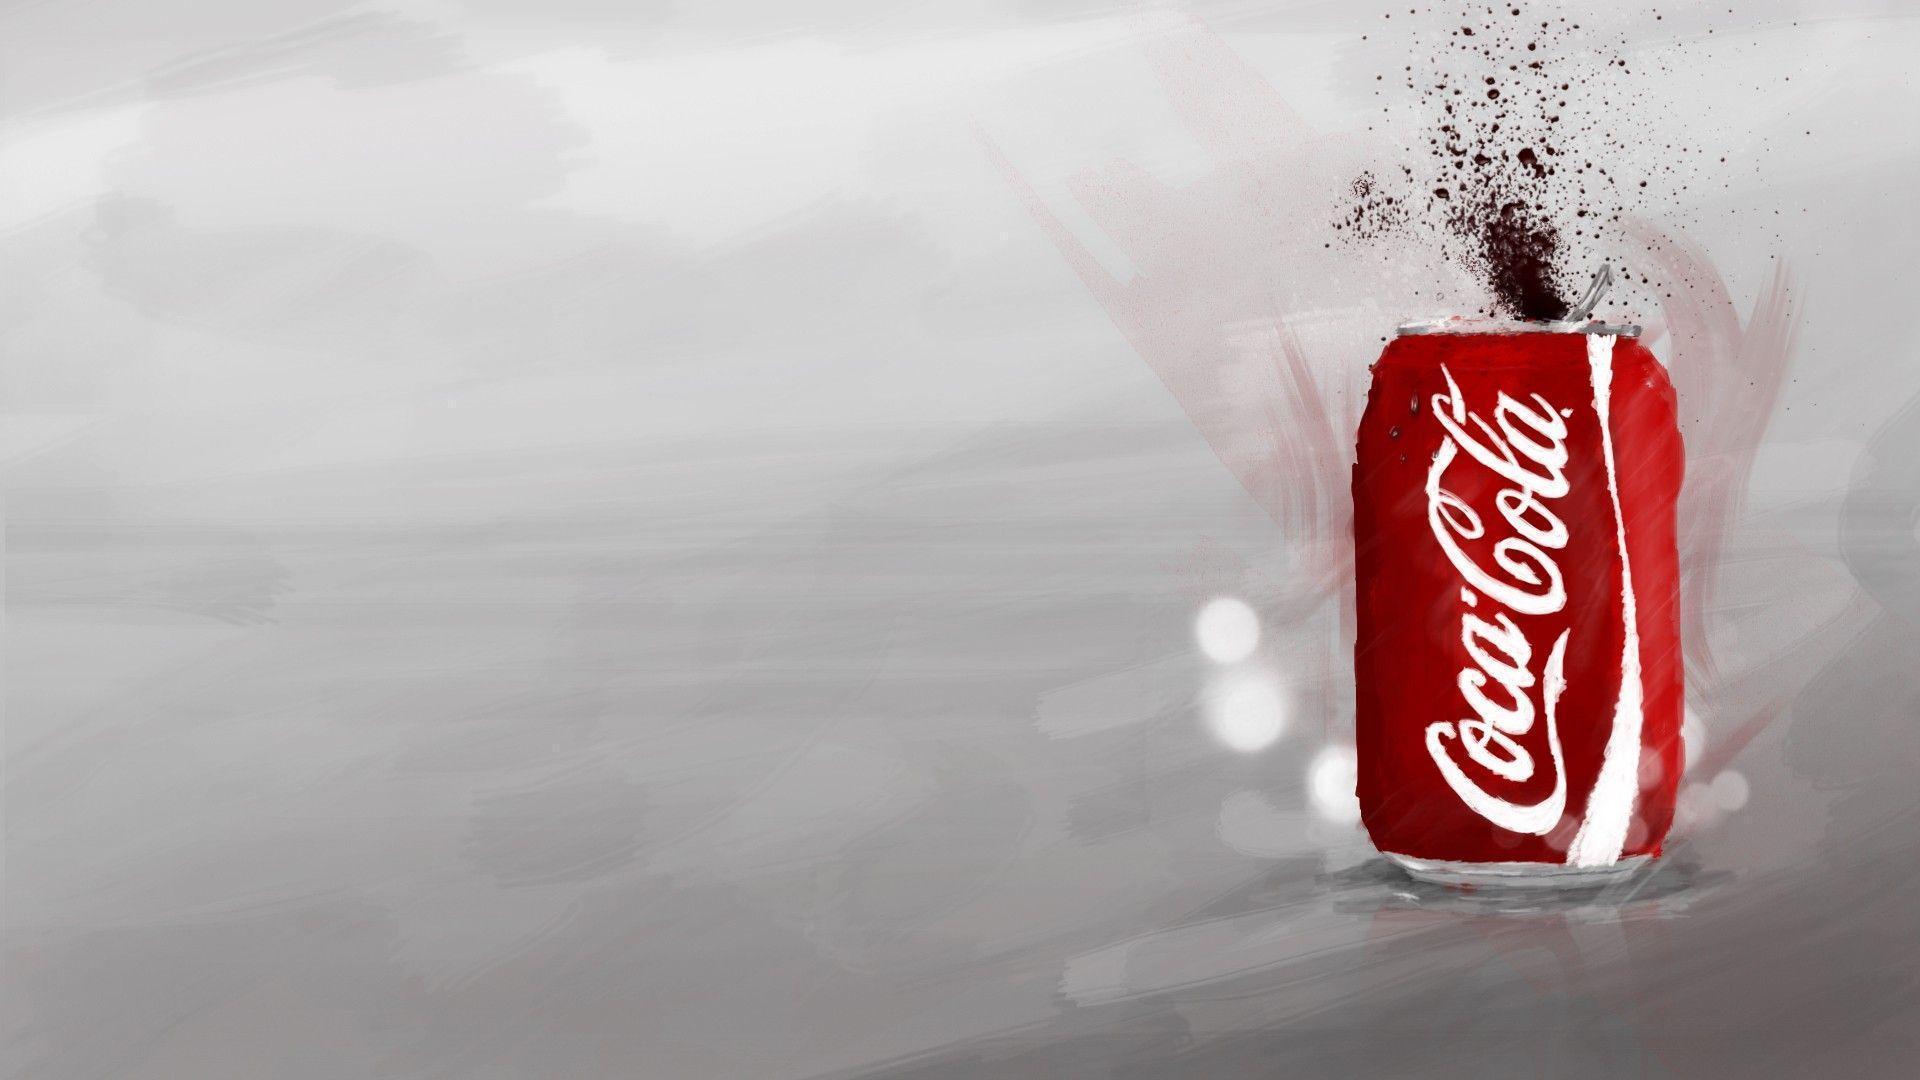 coca cola company background essay The coca-cola company essay writing service, custom the coca-cola company papers, term papers, free the coca-cola company samples, research papers, help.